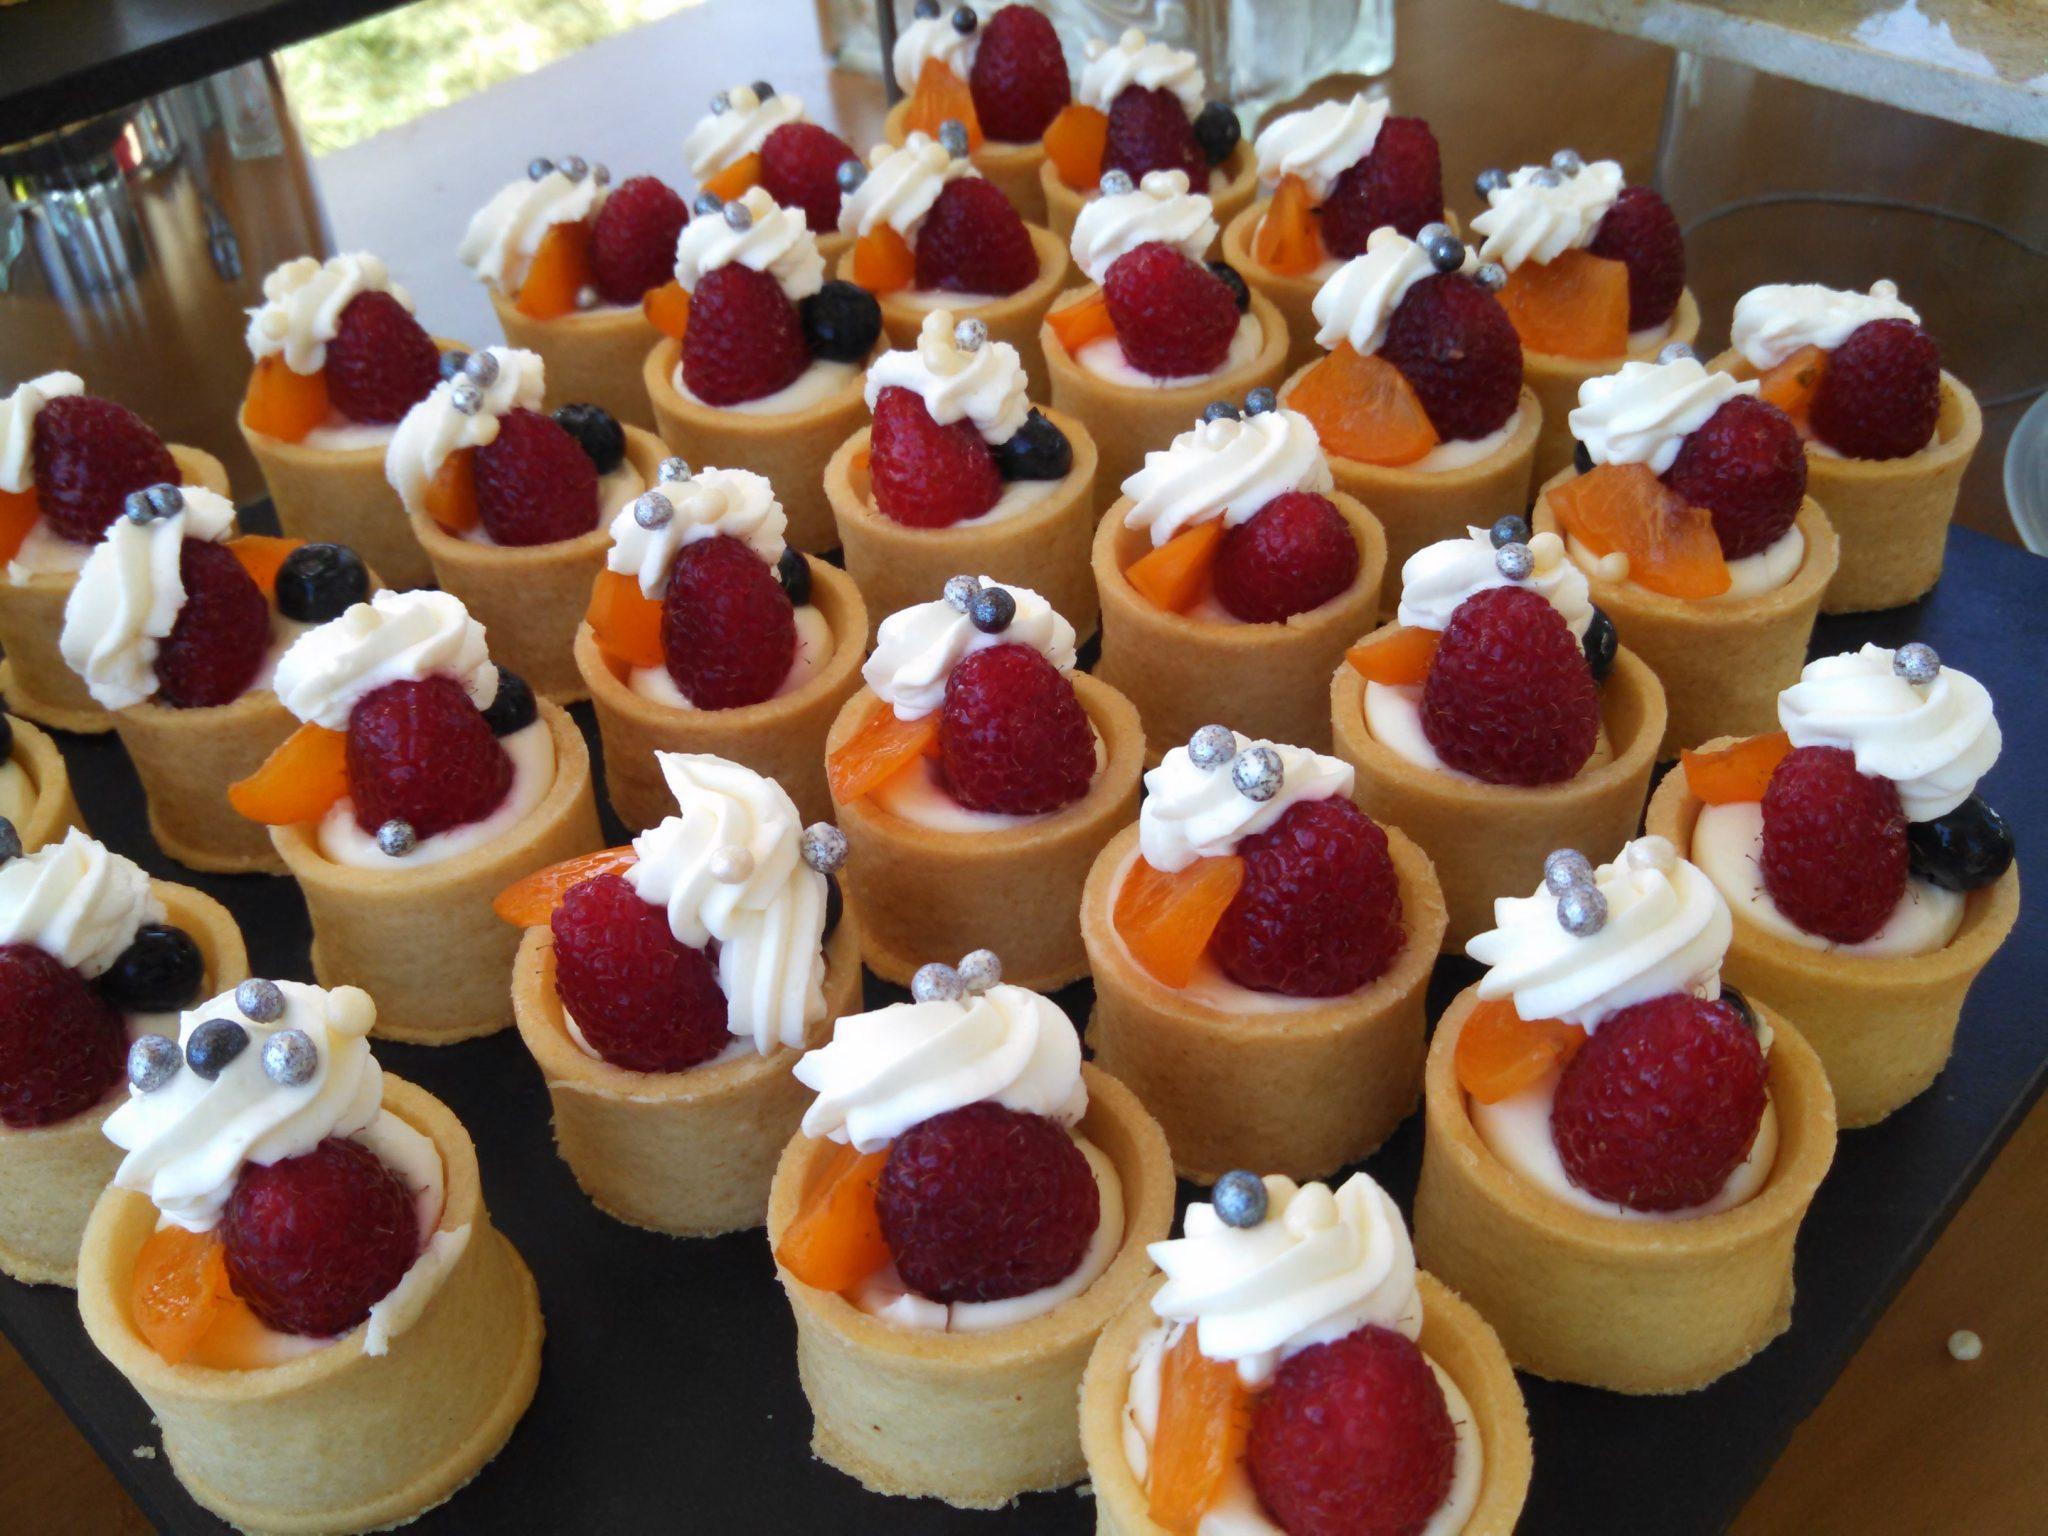 Terranea Resort 5th Anniversary Dessert